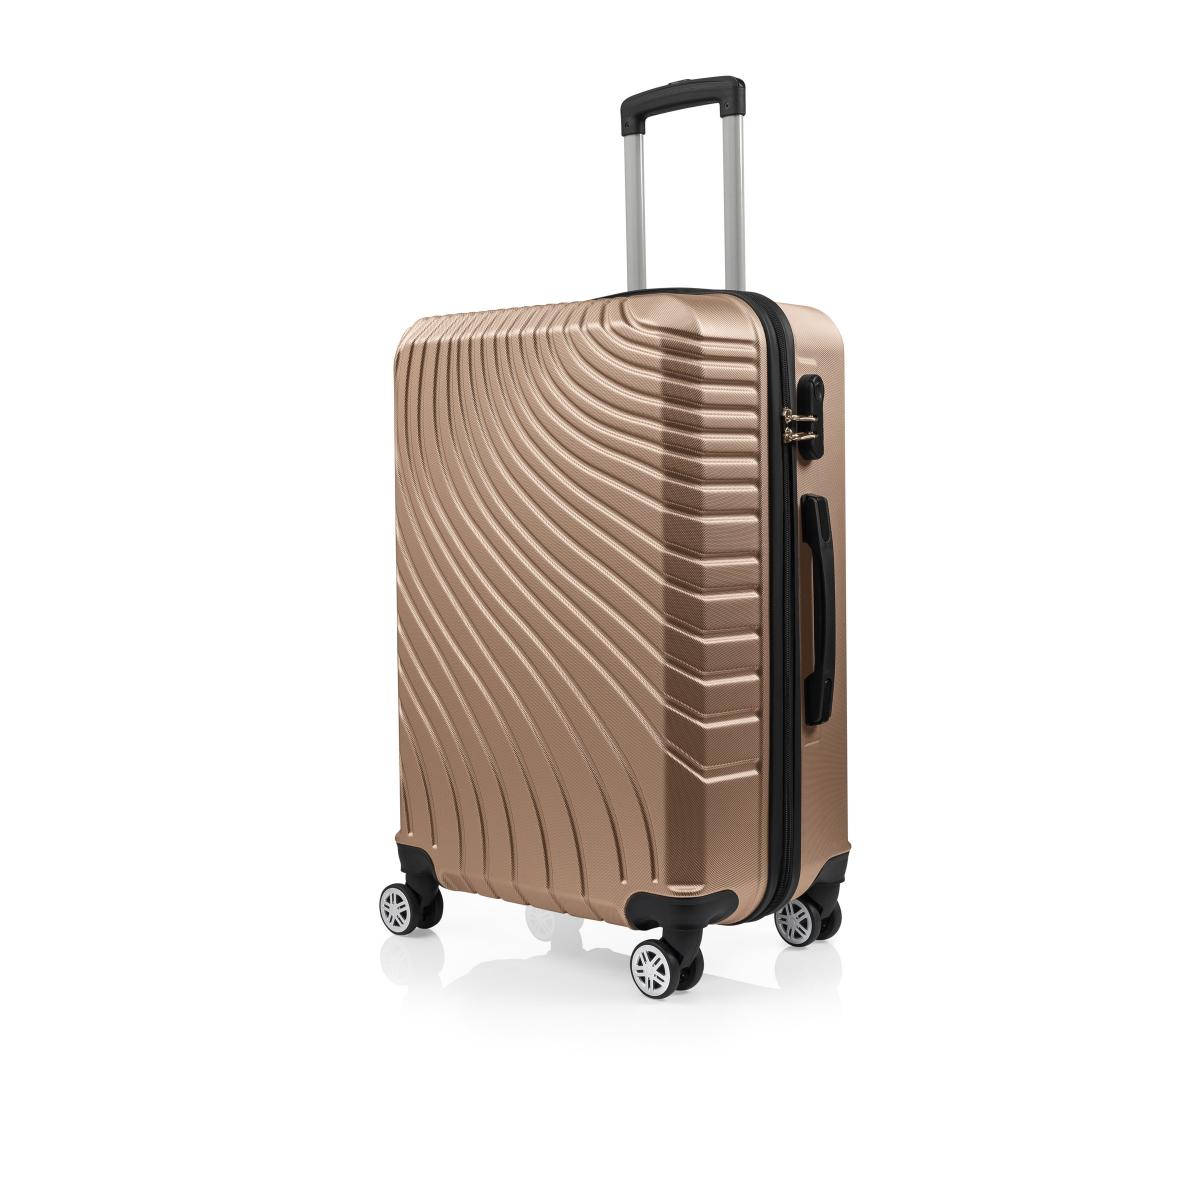 Gedox Abs 3'lü Valiz Seyahat Seti - Model:700.06 Gold